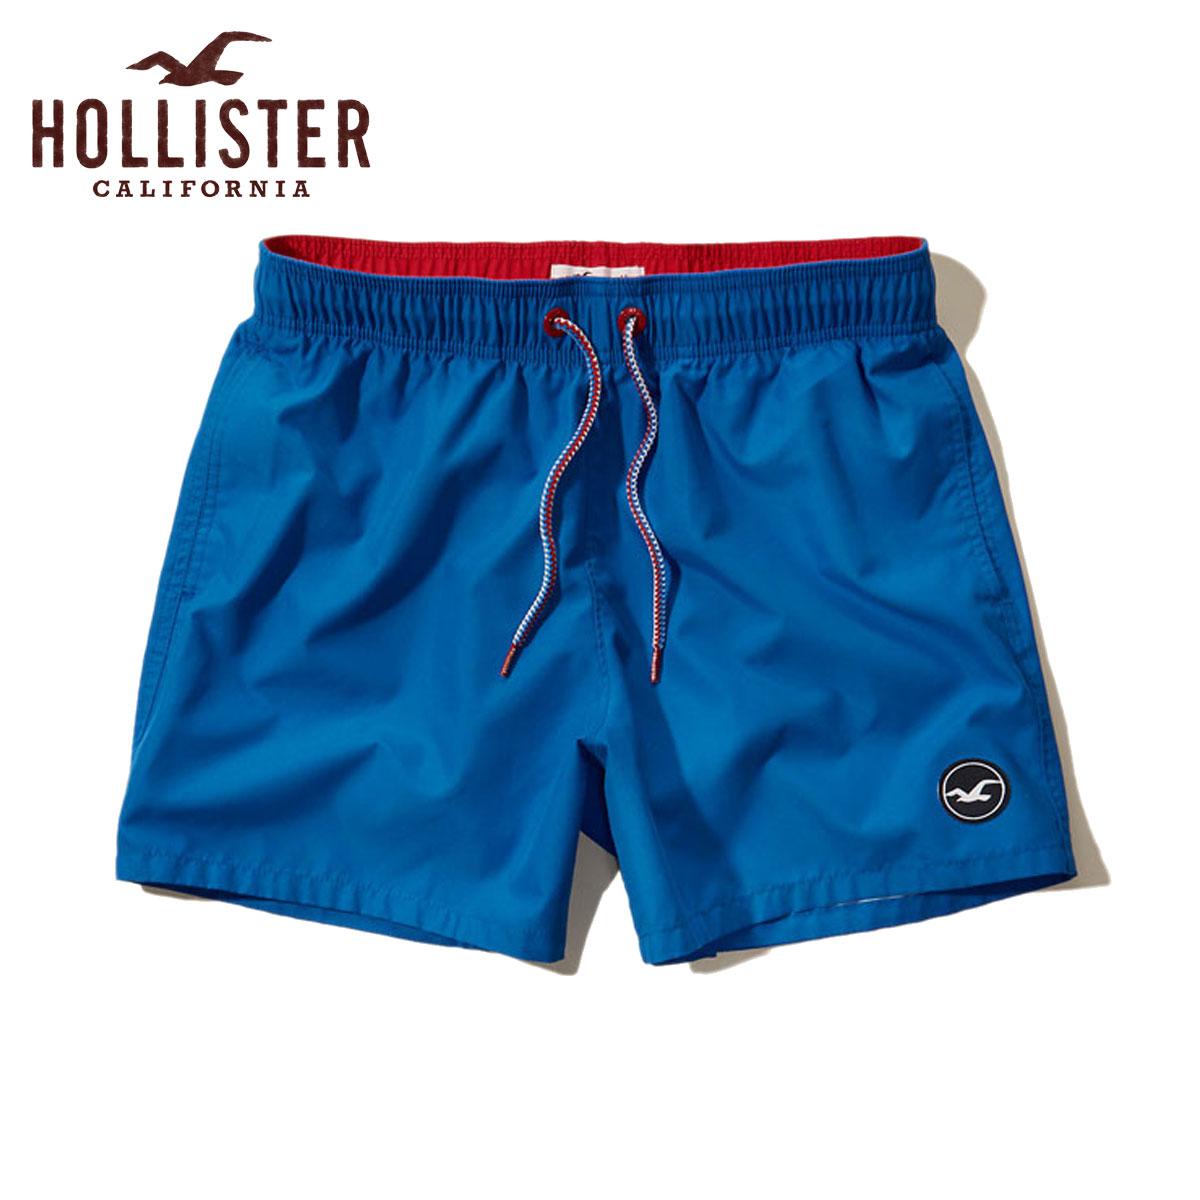 06303aef08 Hori star HOLLISTER regular article men swimming underwear swimsuit  Contrast Guard Fit Swim Shorts 333- ...